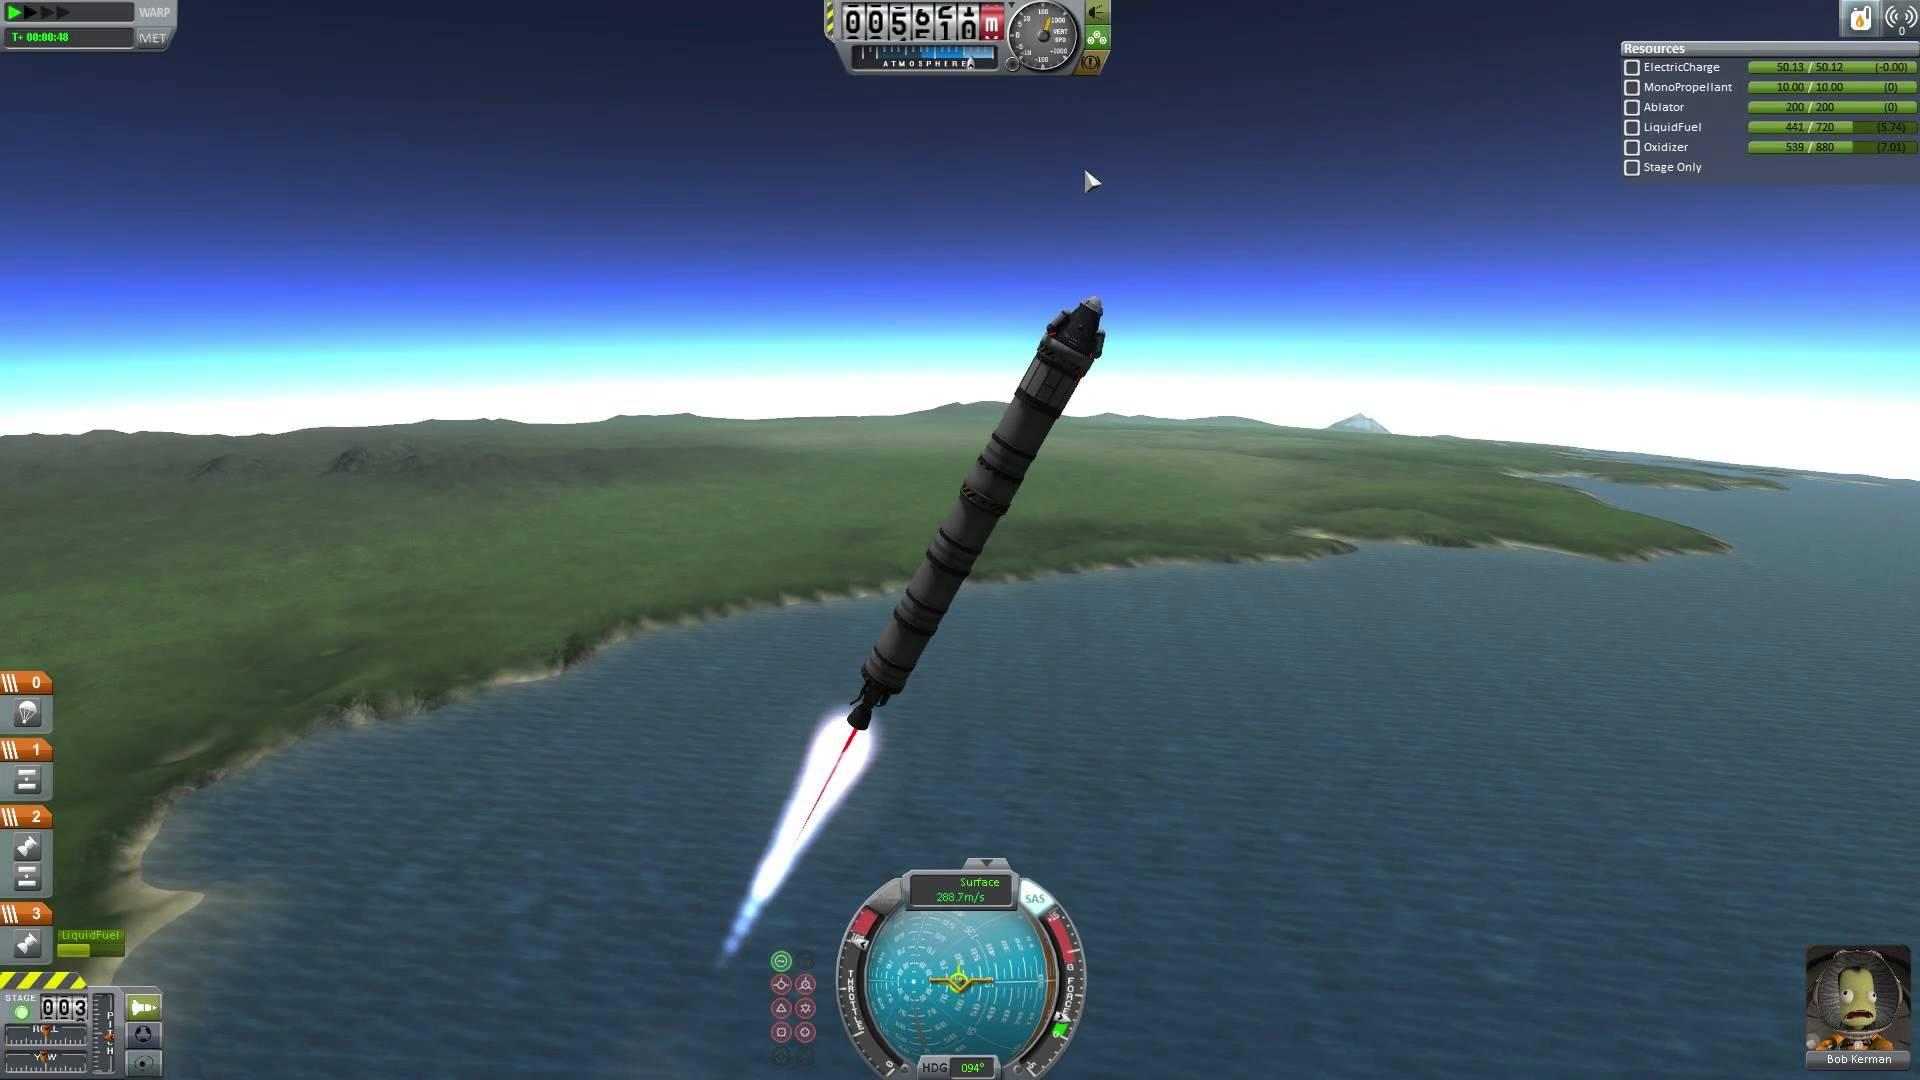 Felipe Falanghe deja el liderazgo de Kerbal Space Program